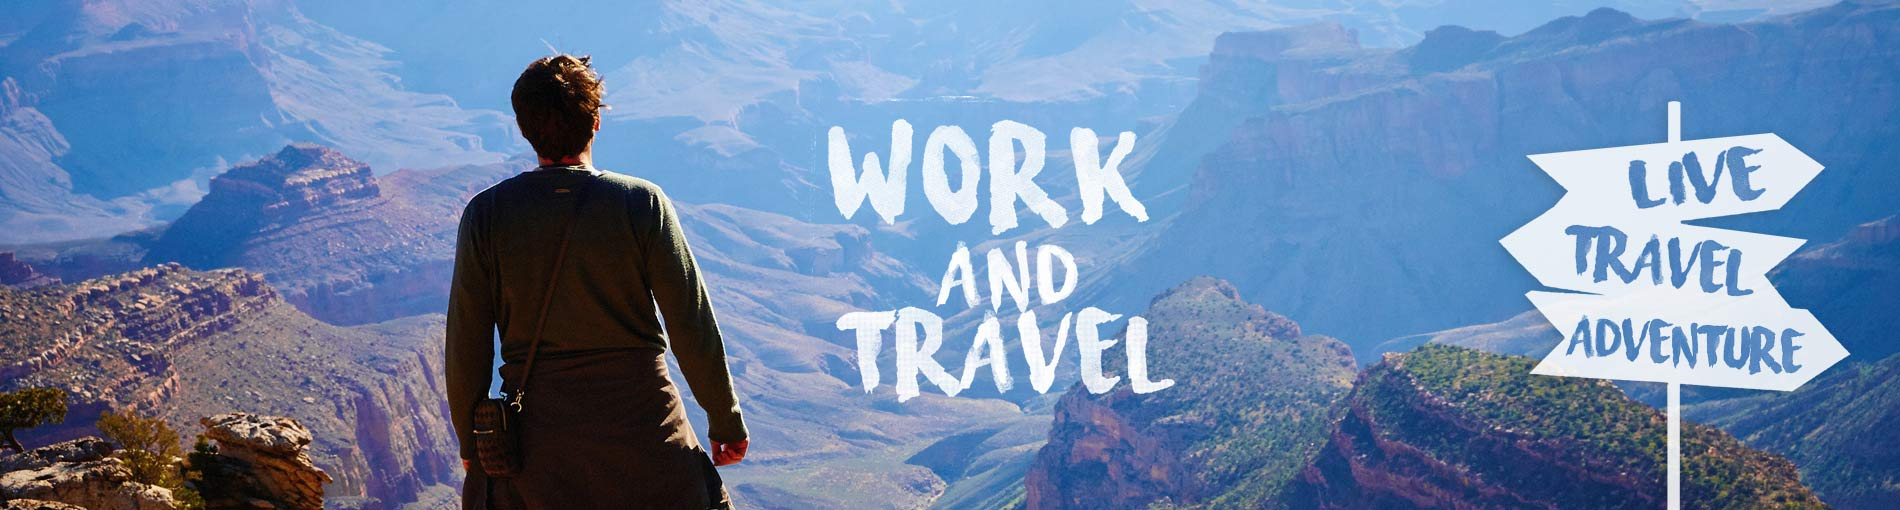 Программа Work and Travel - как стать участником